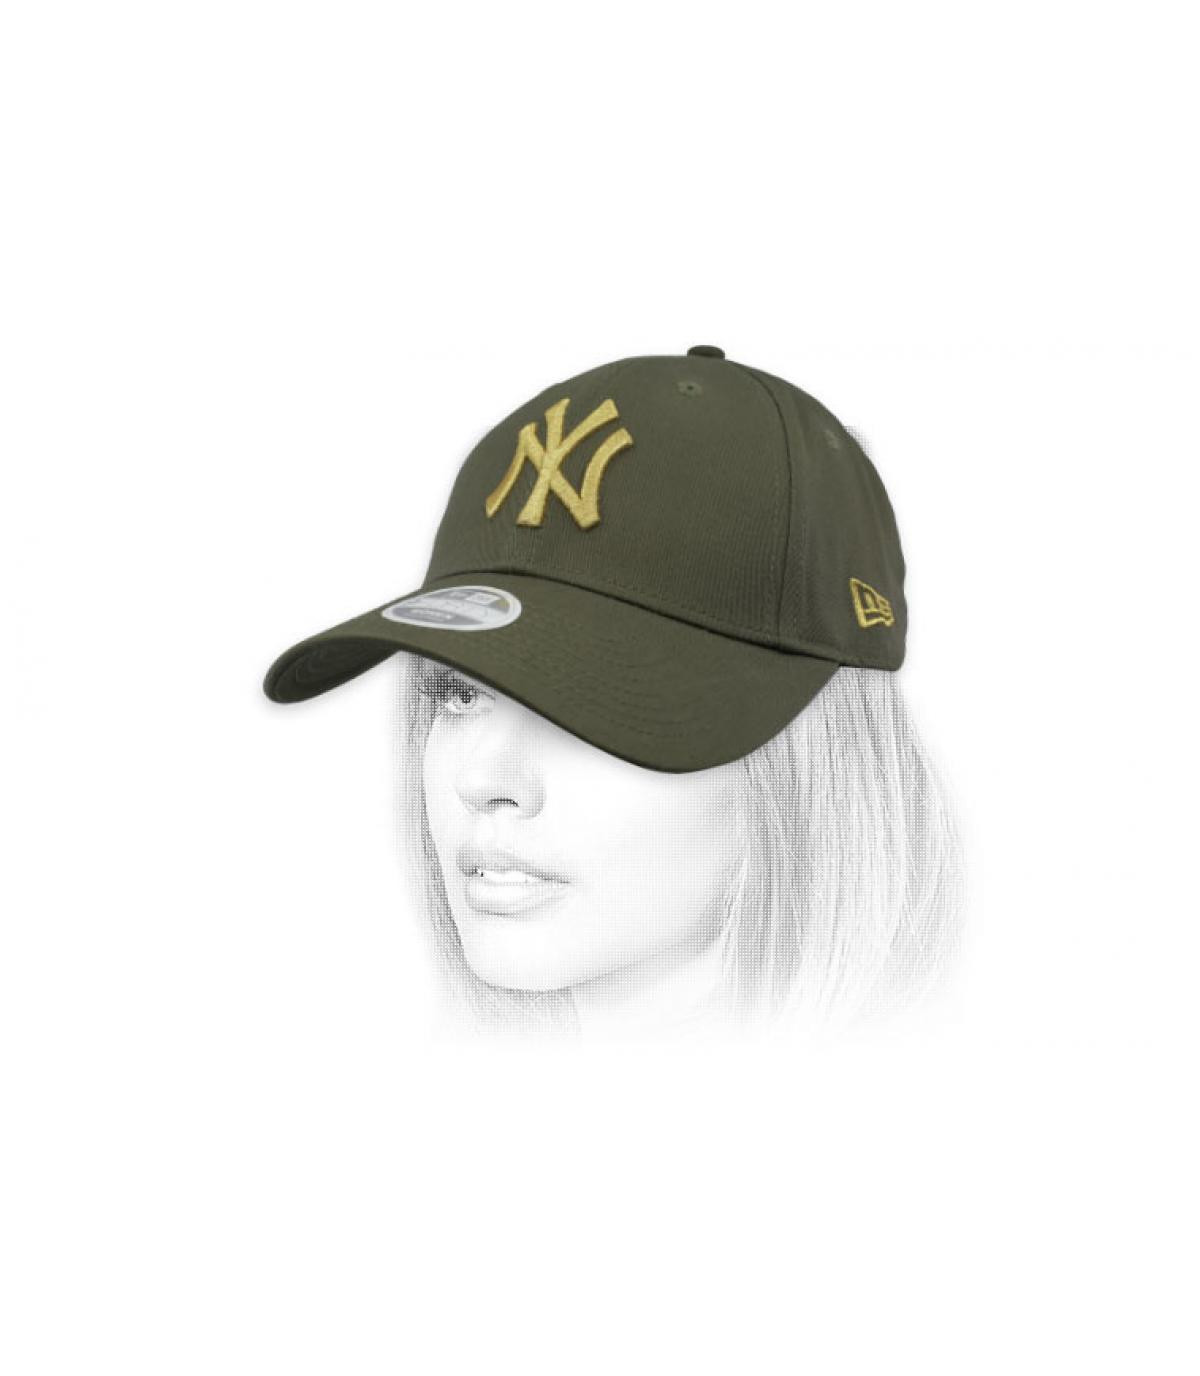 gorra niño NY verde oro